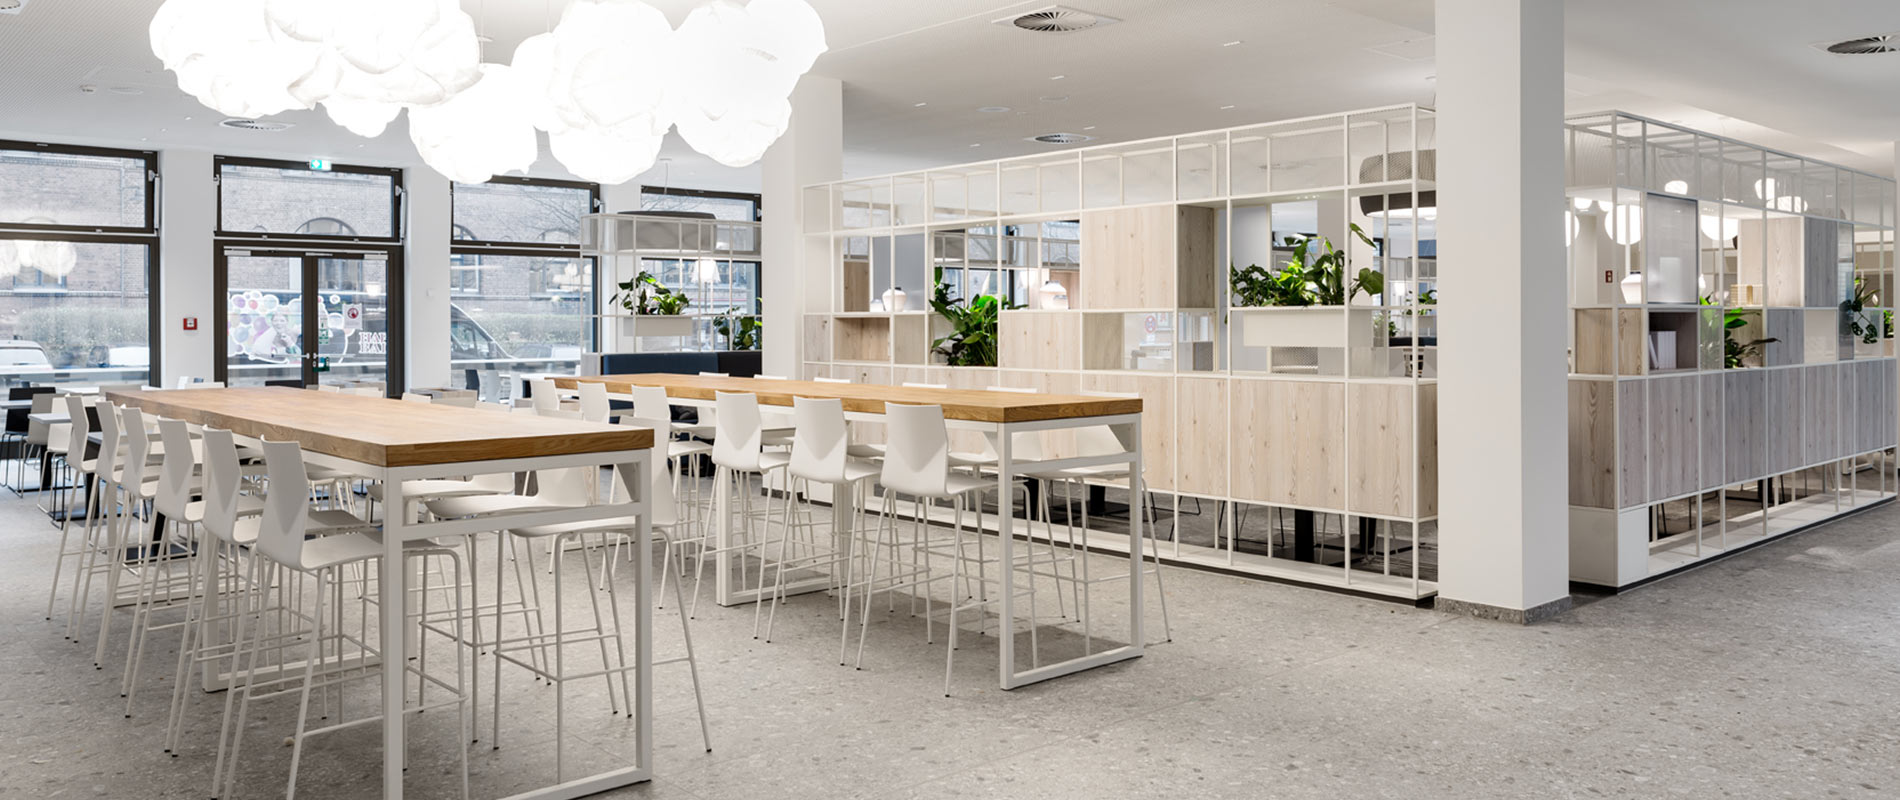 Cafe Rosink Nordhorn Kantine Bestuhlung Raumtrenner Euler Hermes Hamburg Neu